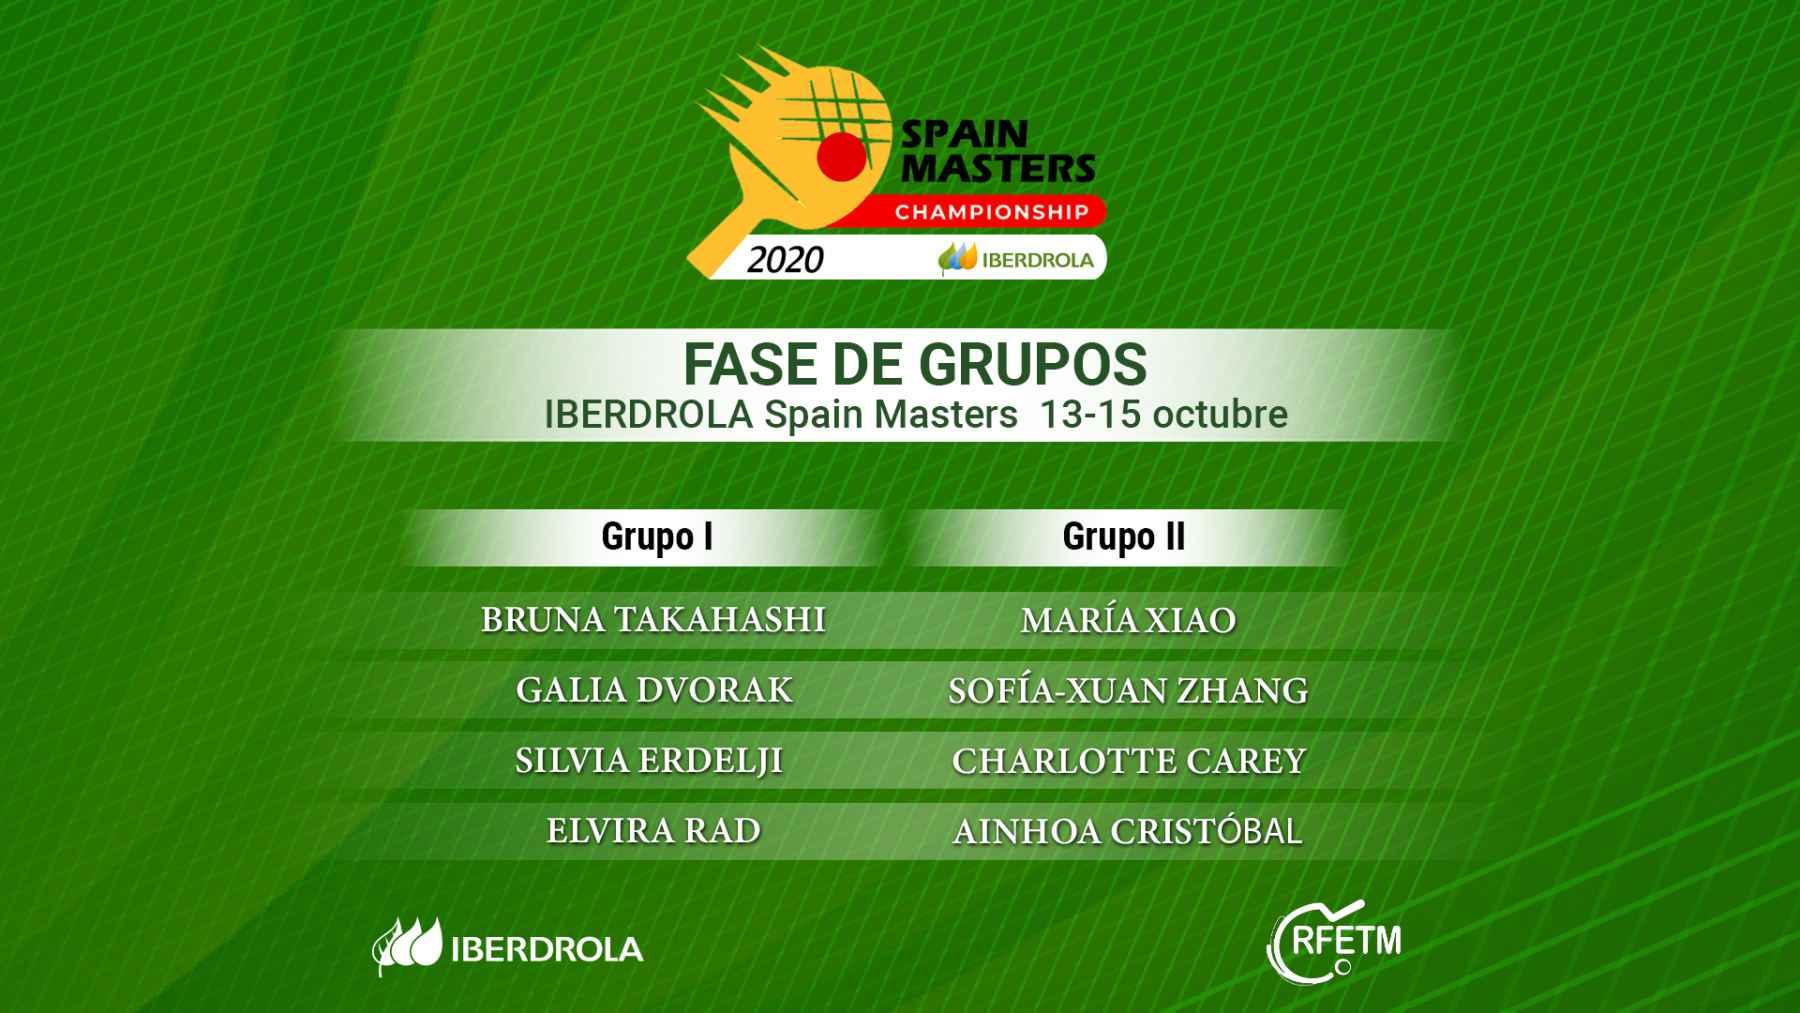 Composición Grupos IBERDROLA Spain Masters 2020